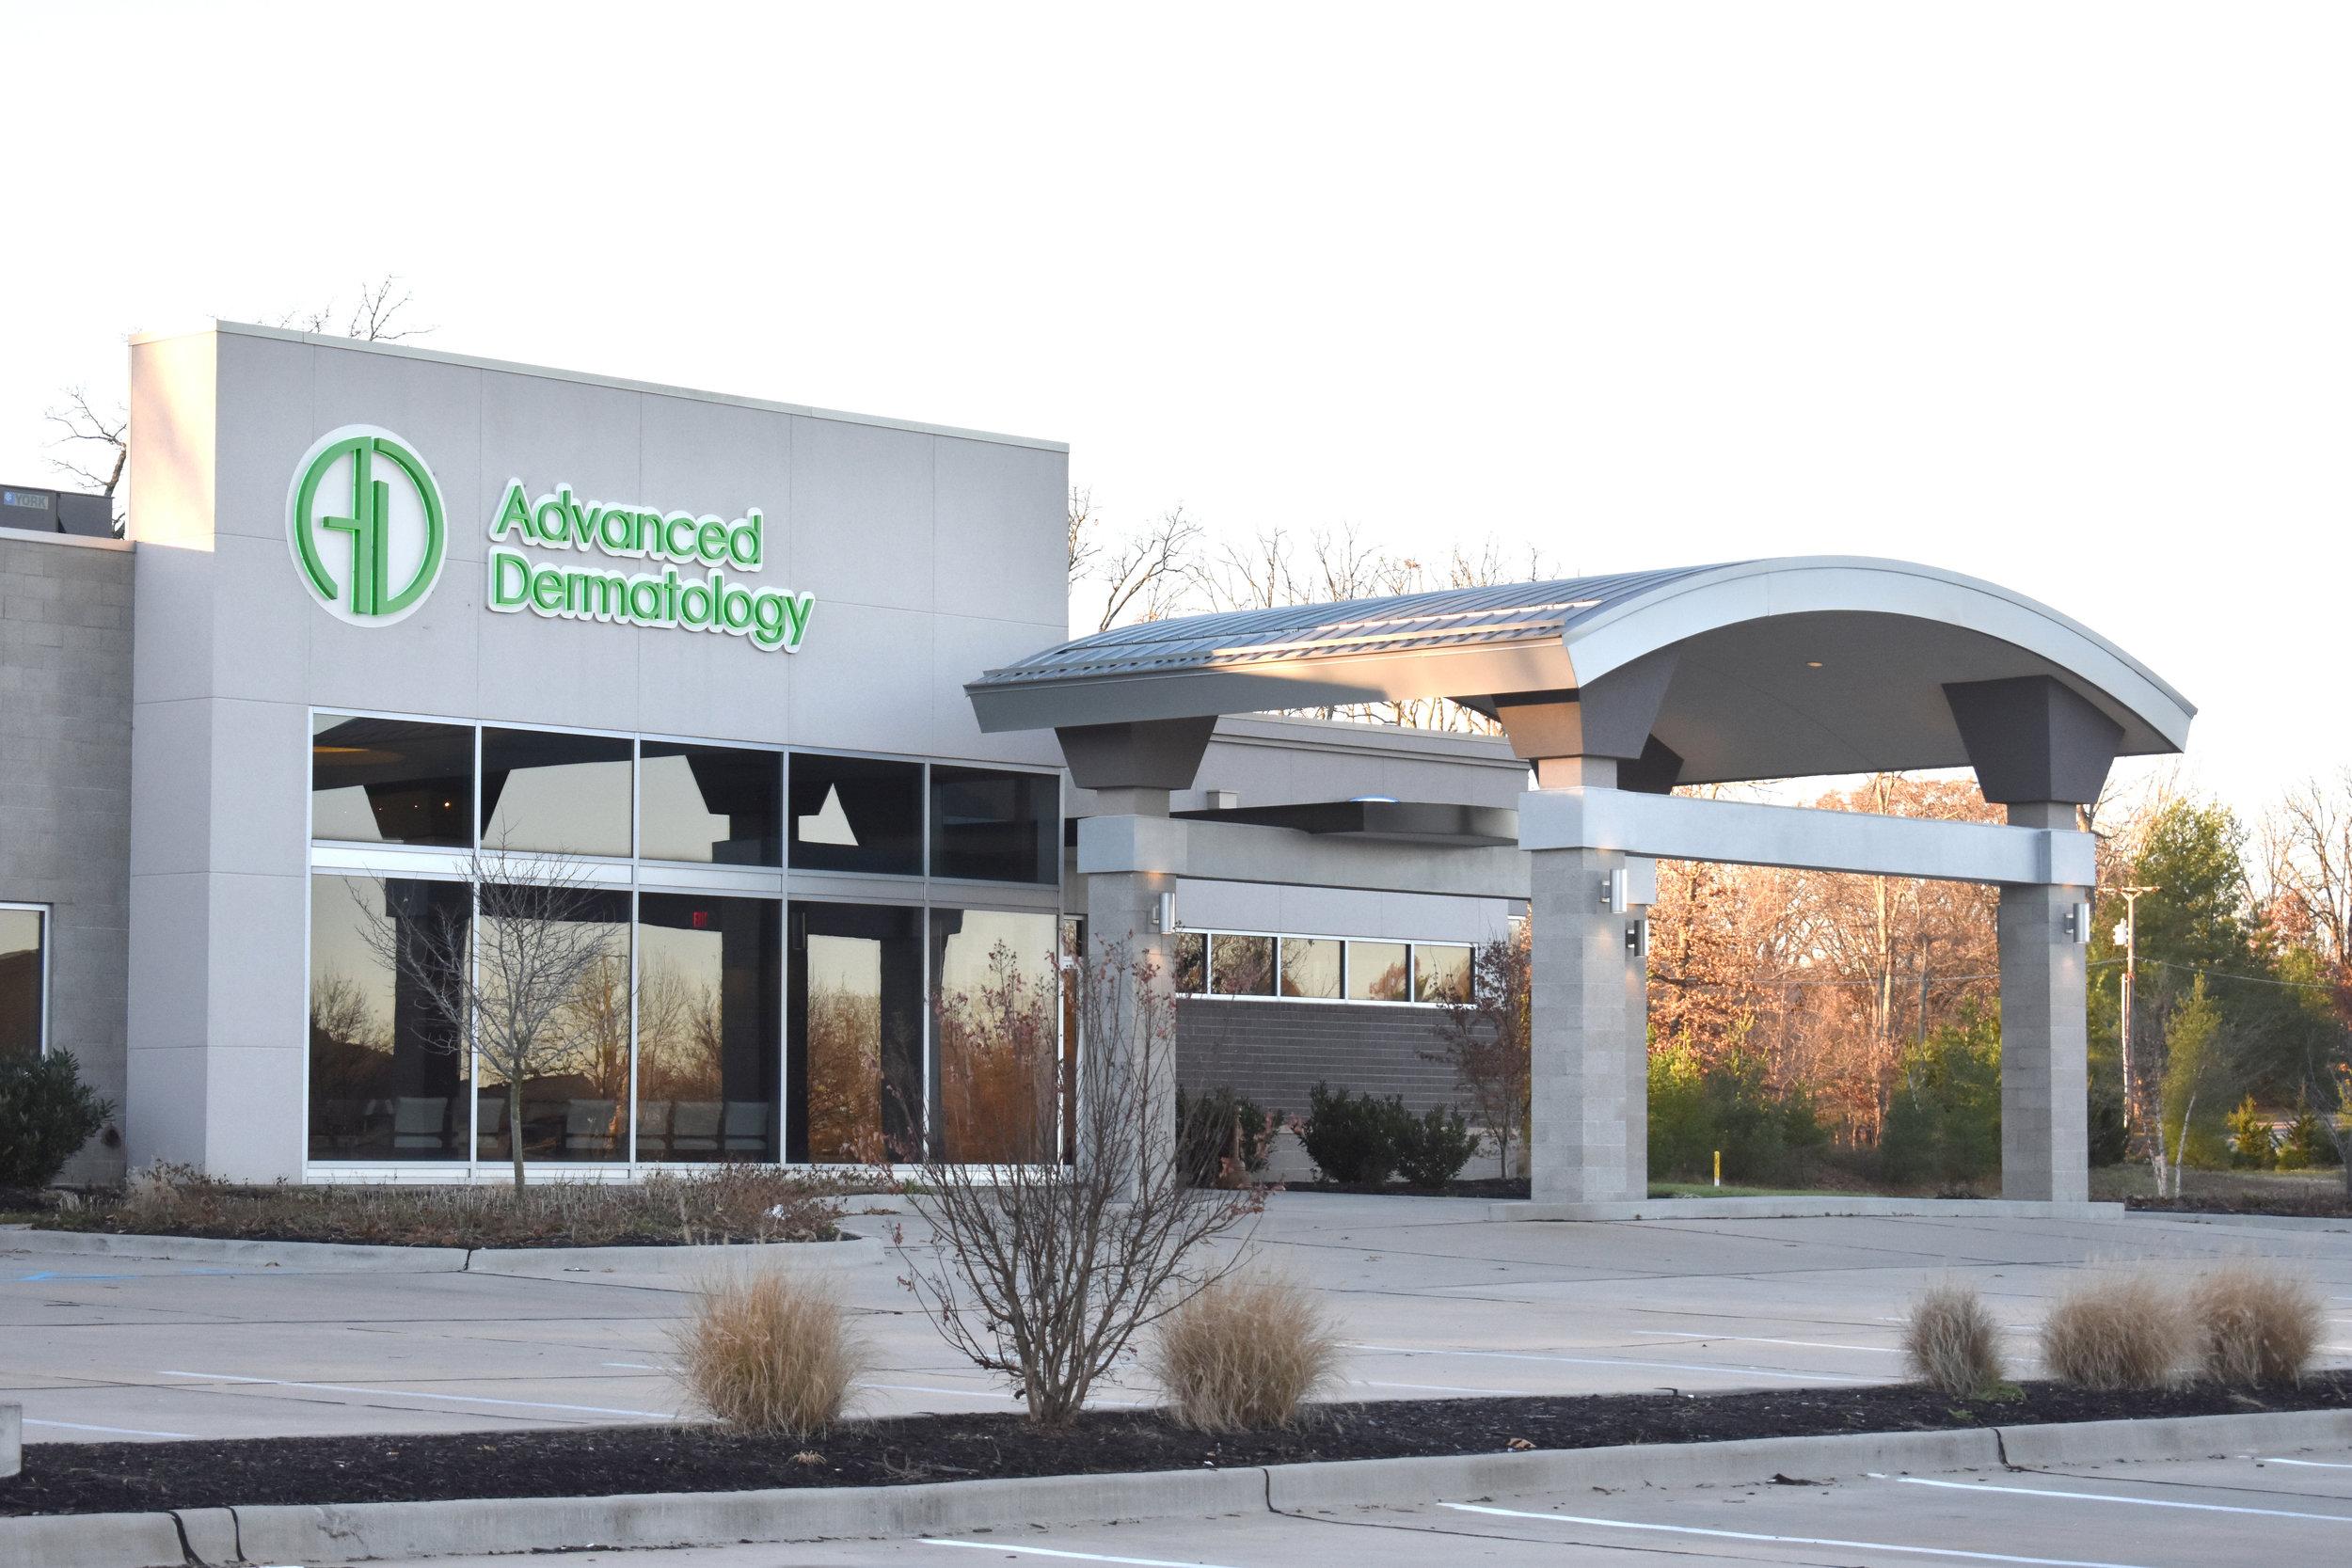 Advanced Dermatology - Cape Girardeau, Missouri